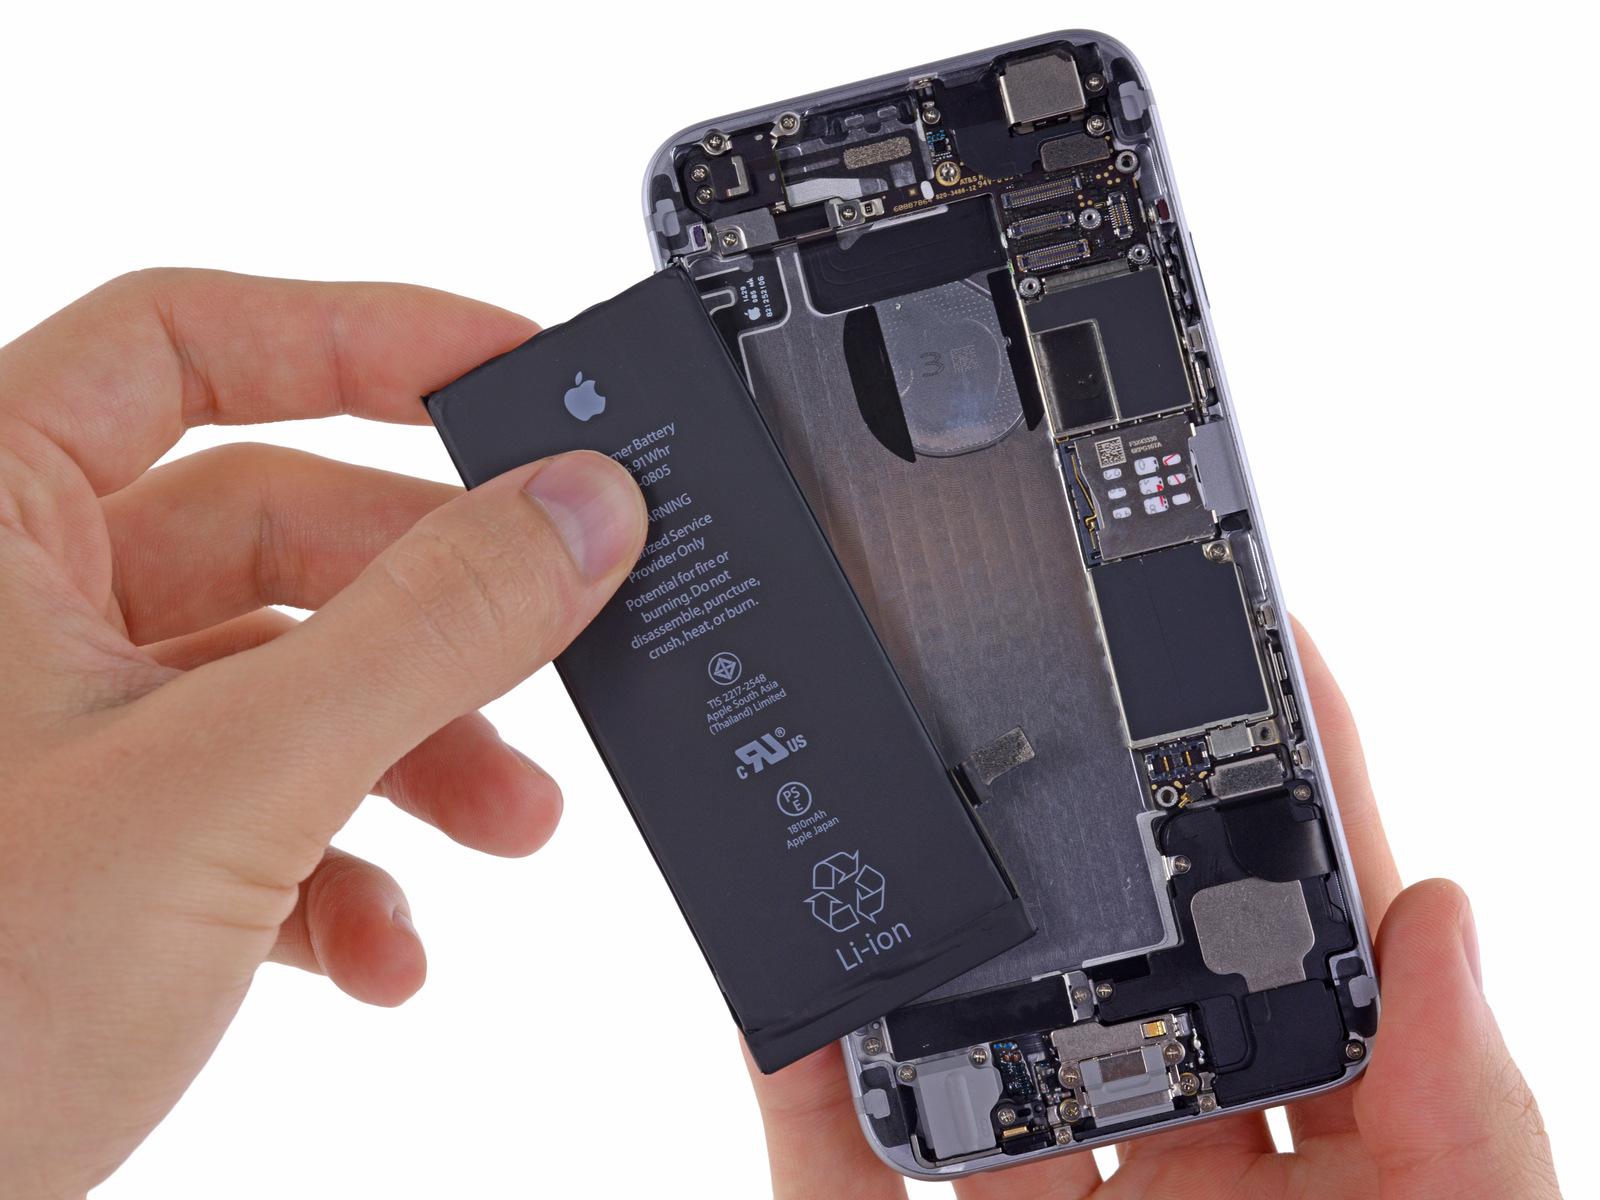 Batterie-Austausch beim iPhone 6